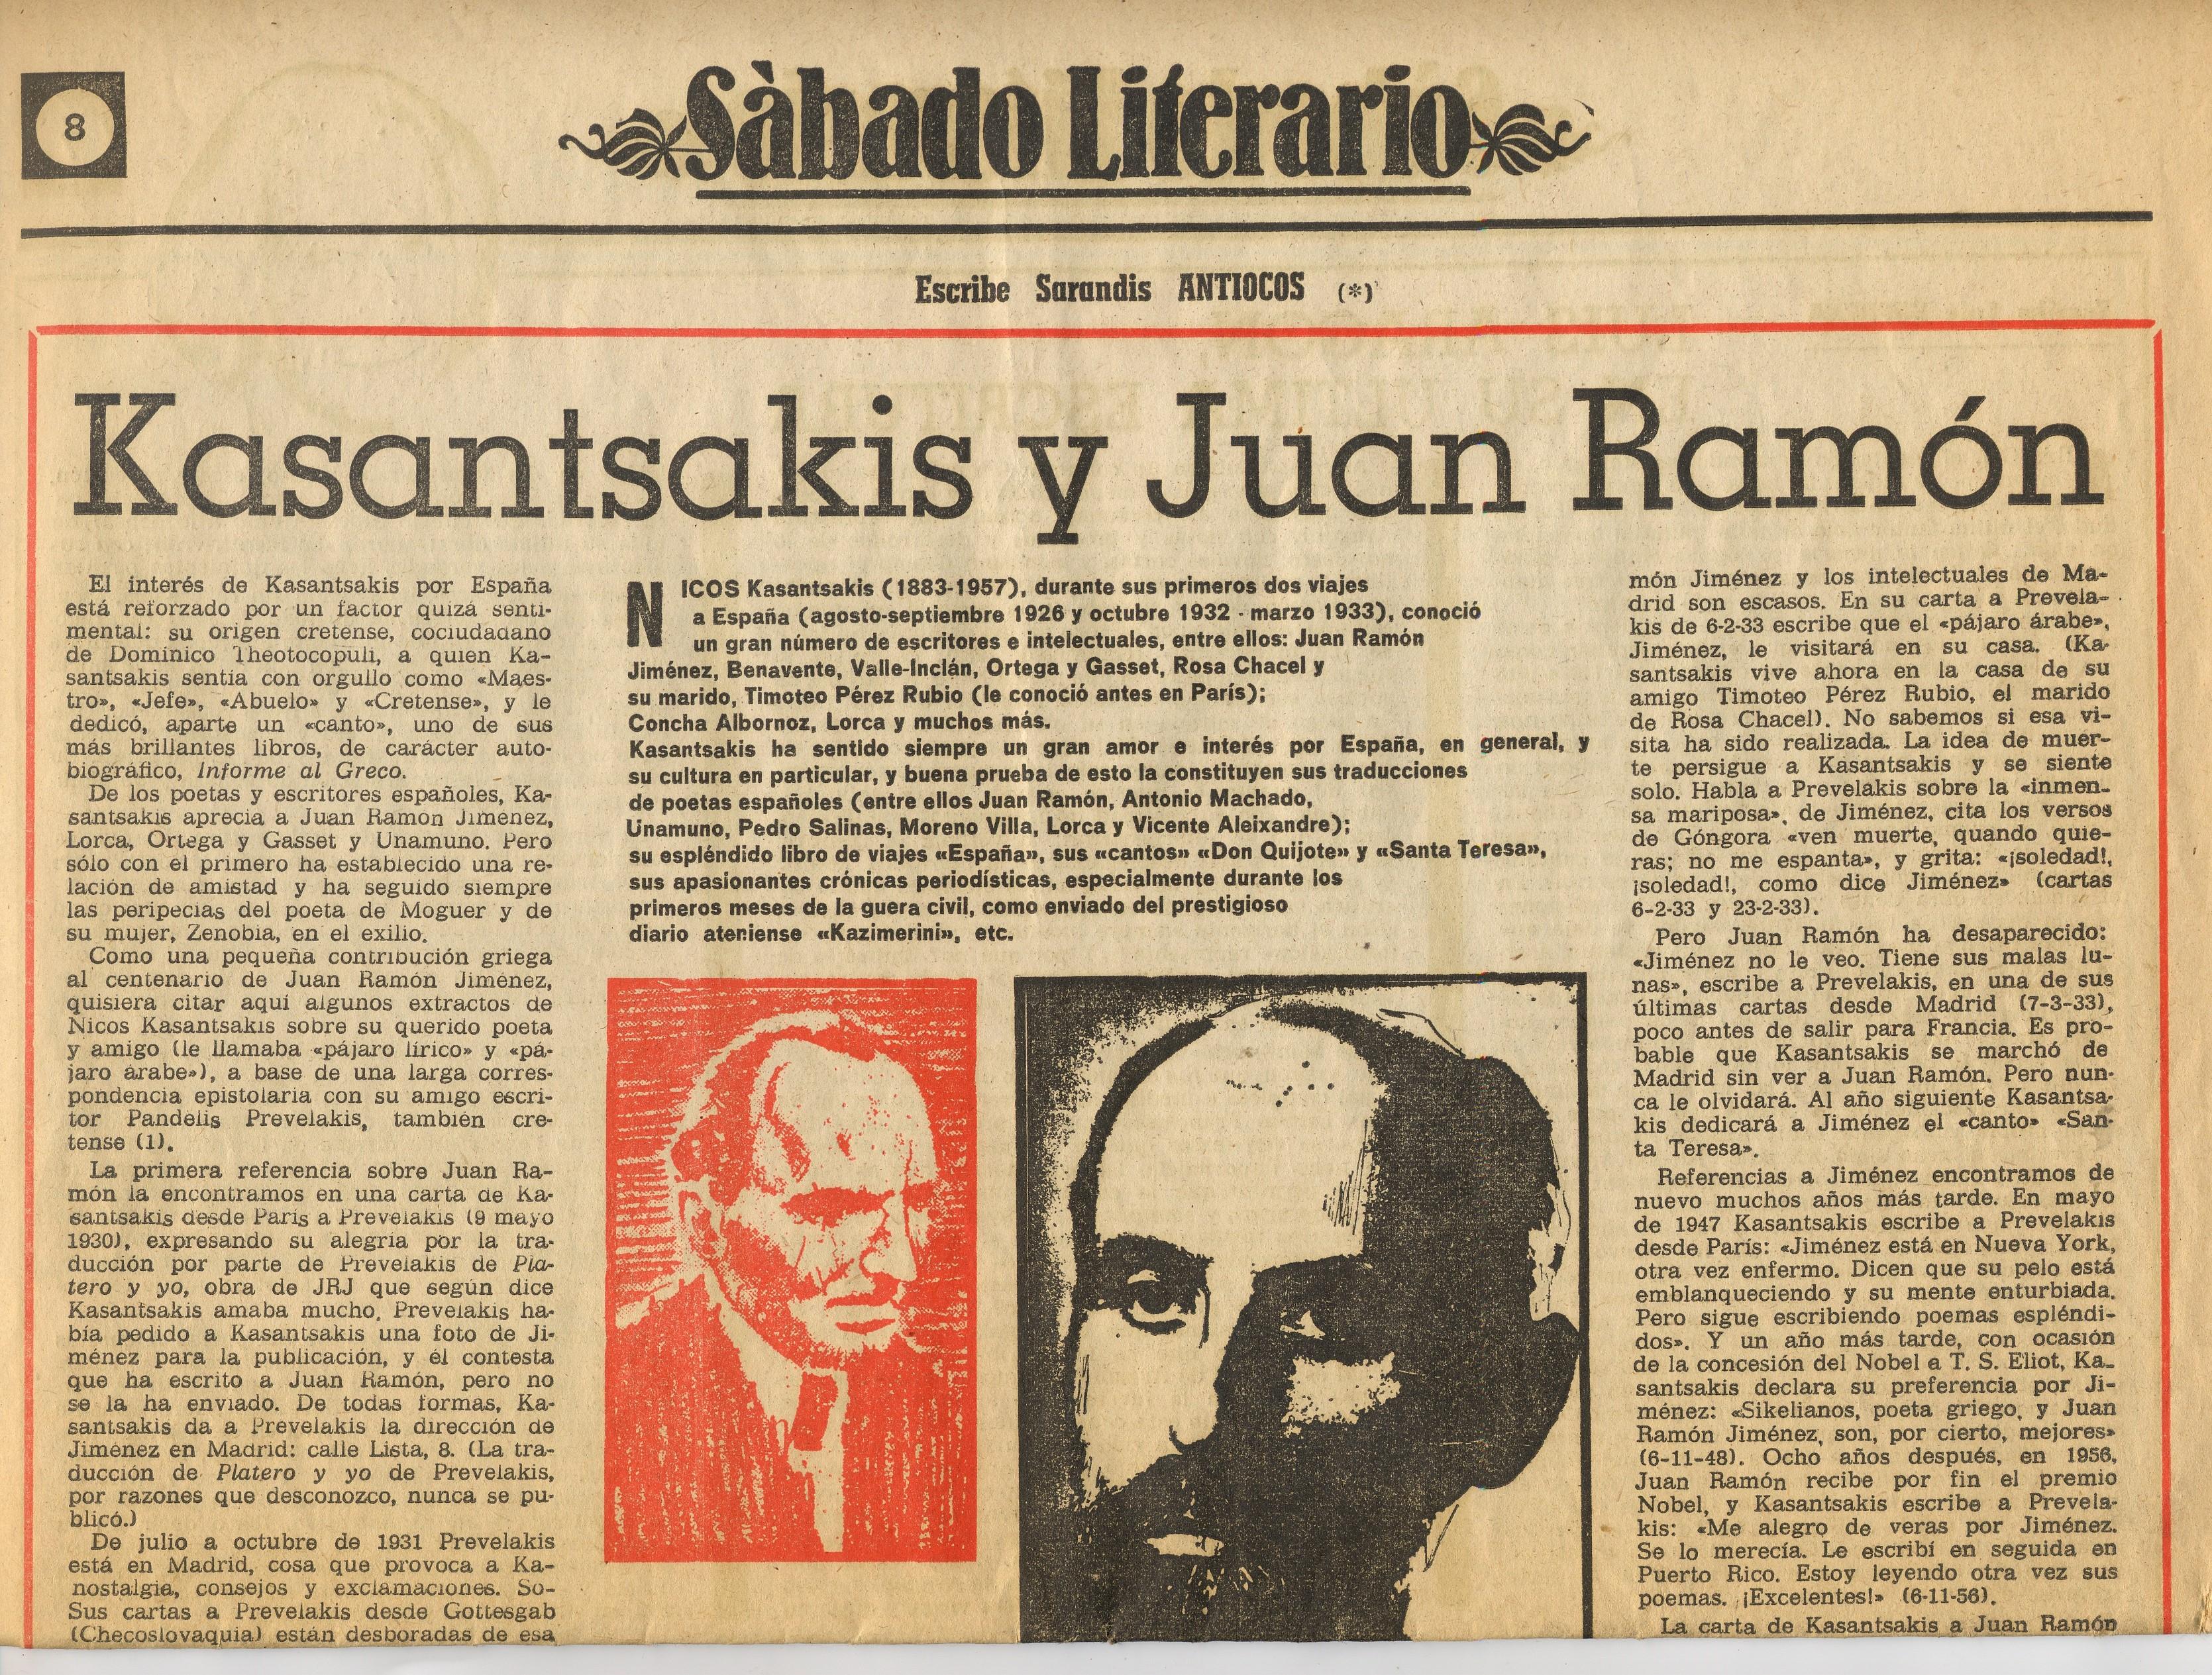 Kasantsakis y Juan Ramón 1